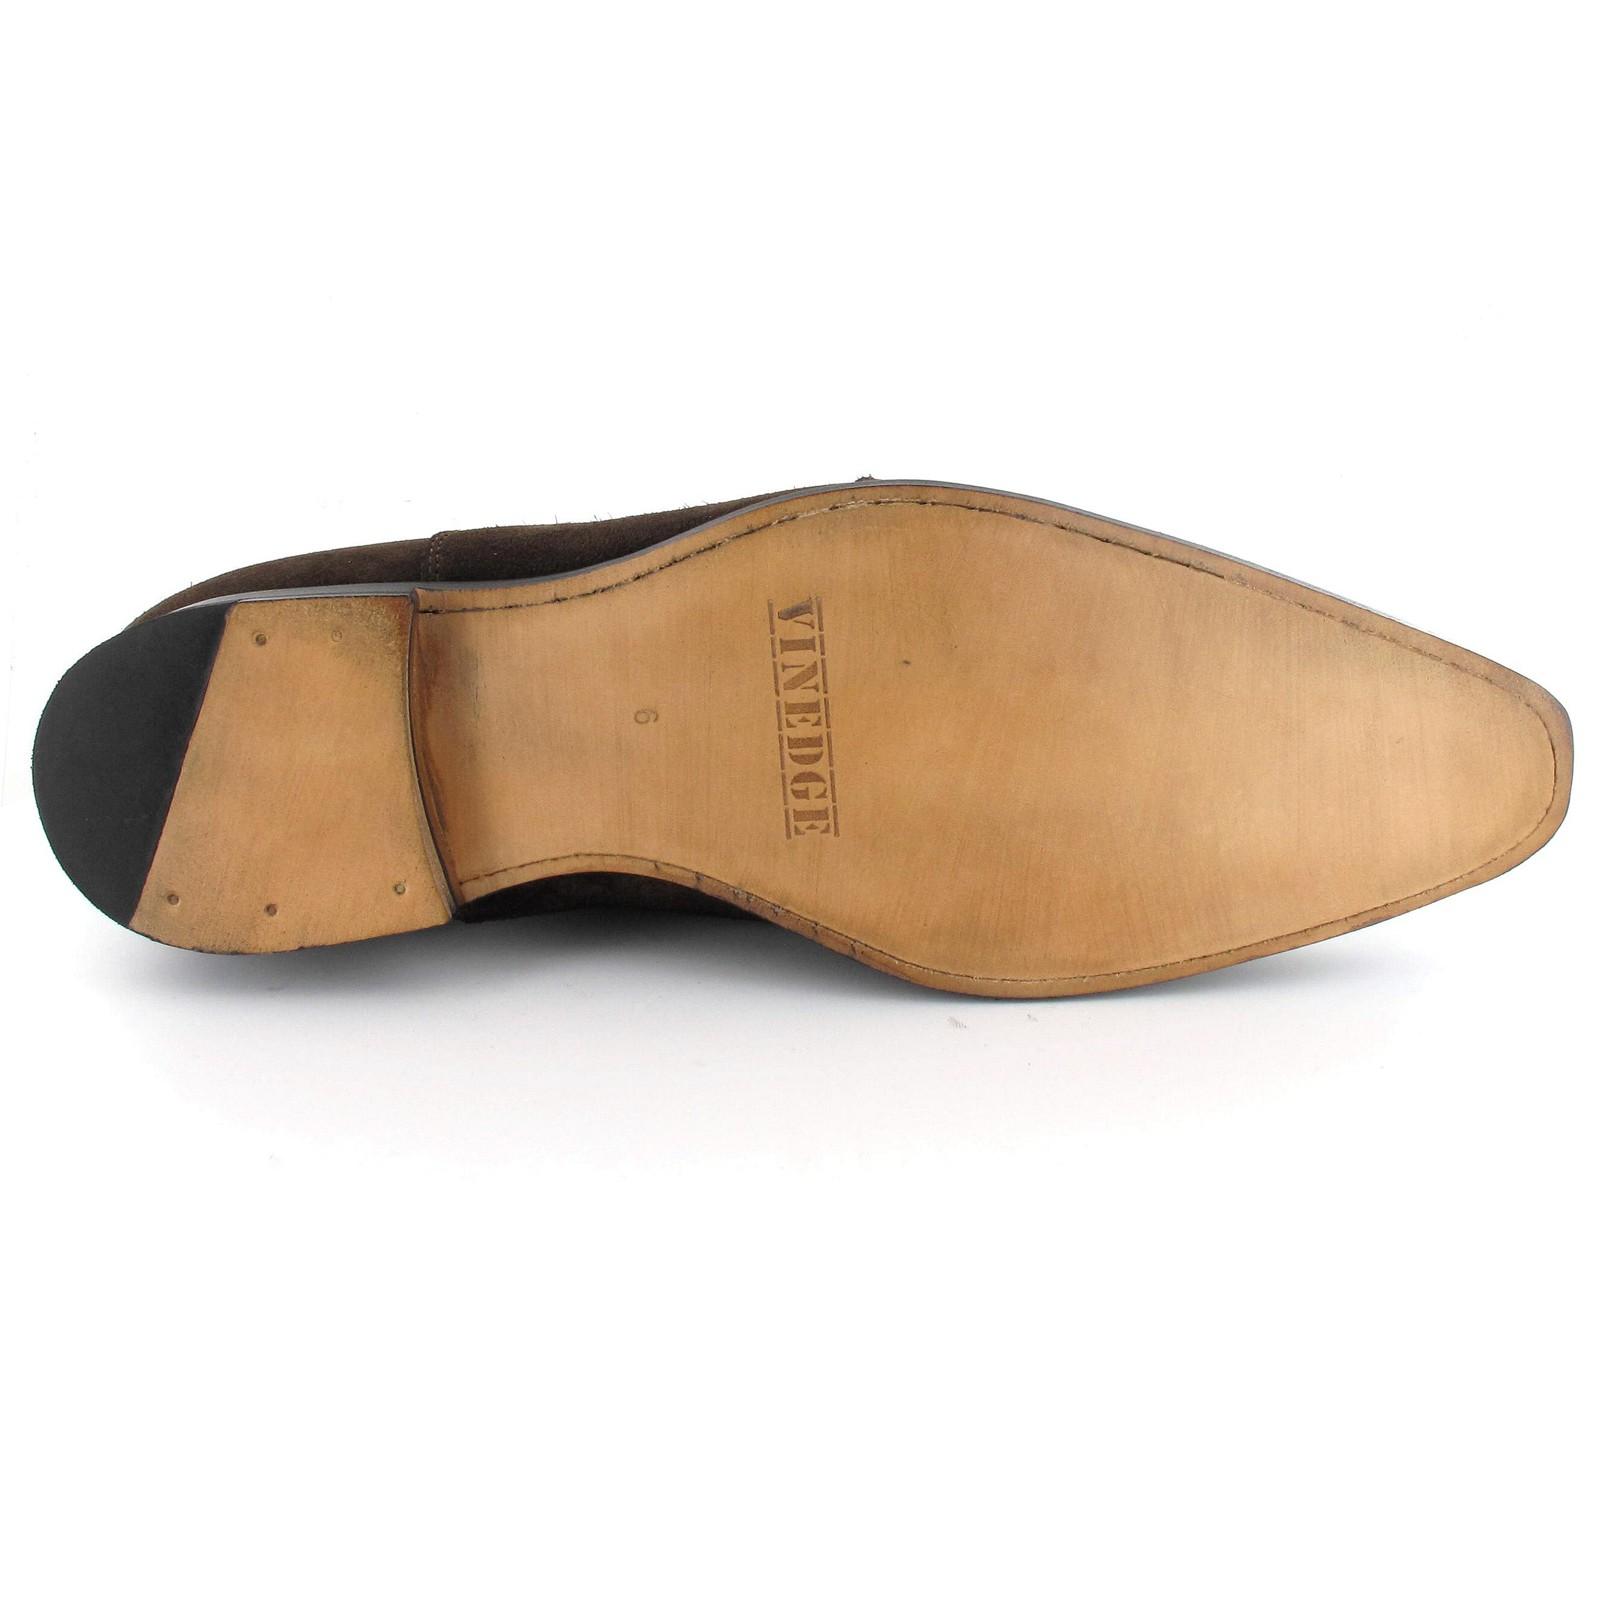 chaussures semelle cuir homme. Black Bedroom Furniture Sets. Home Design Ideas